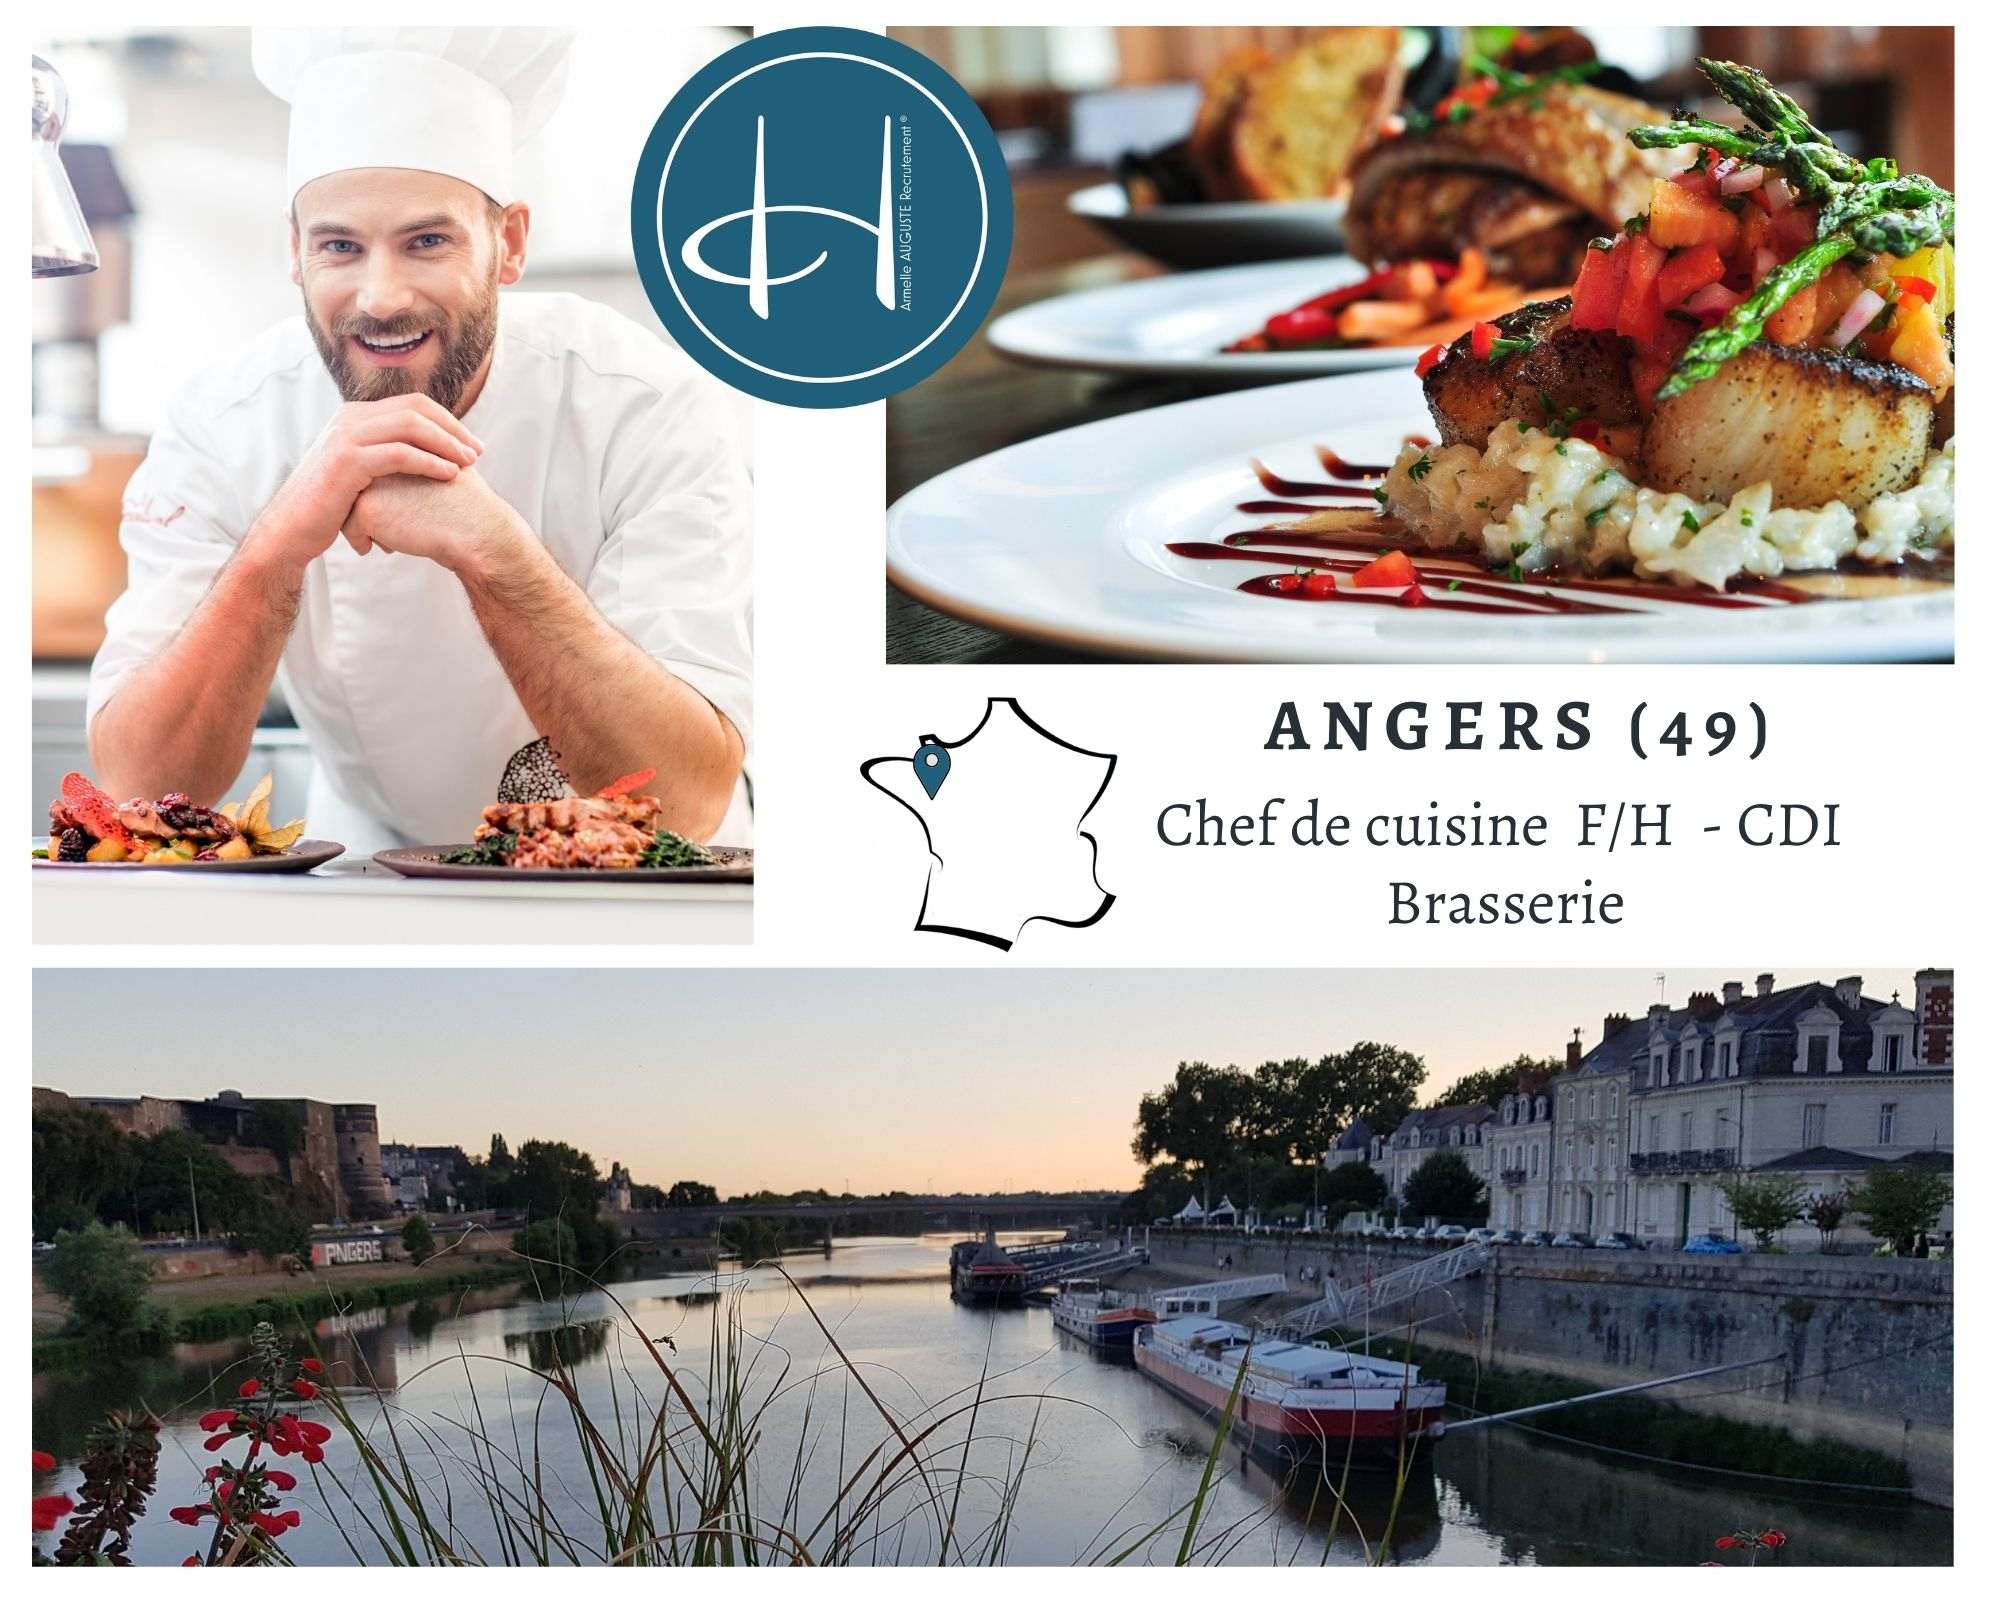 Recrutement: Chef de cuisine brasserie F/H chez Armelle AUGUSTE Recrutement® à Angers